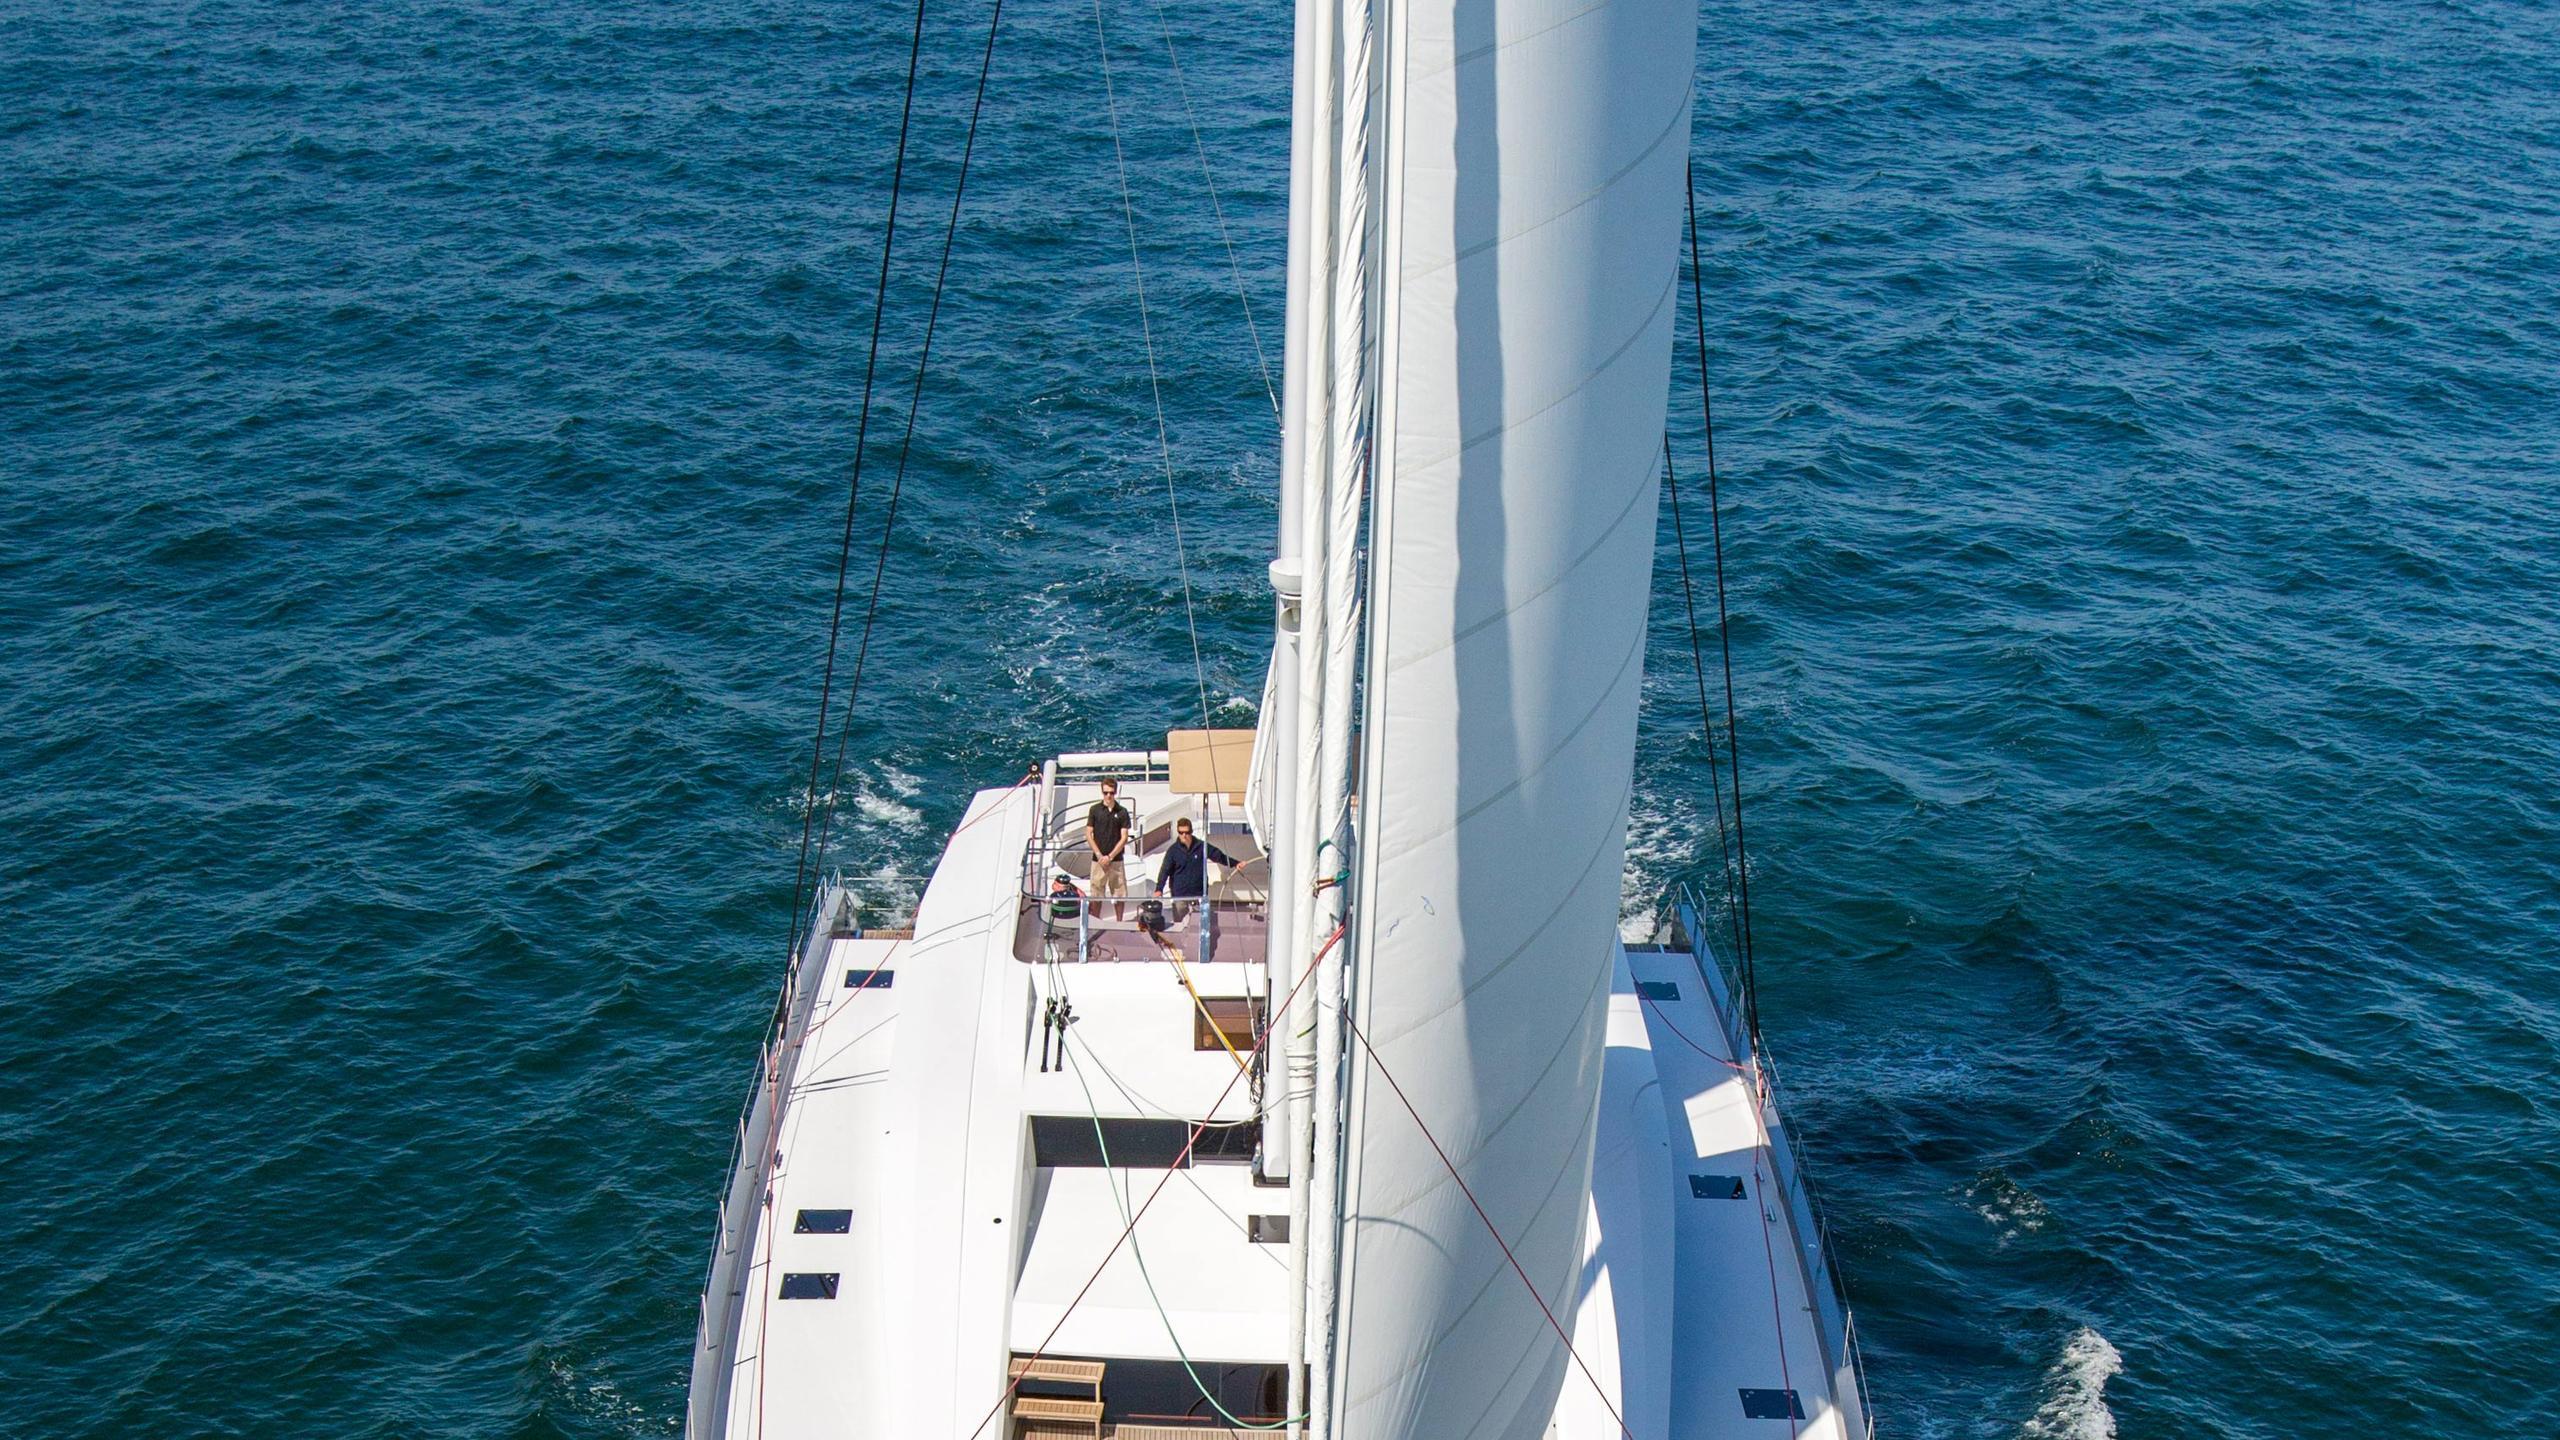 Windquest-catamaran-yacht-jfa-2014-26m-bows